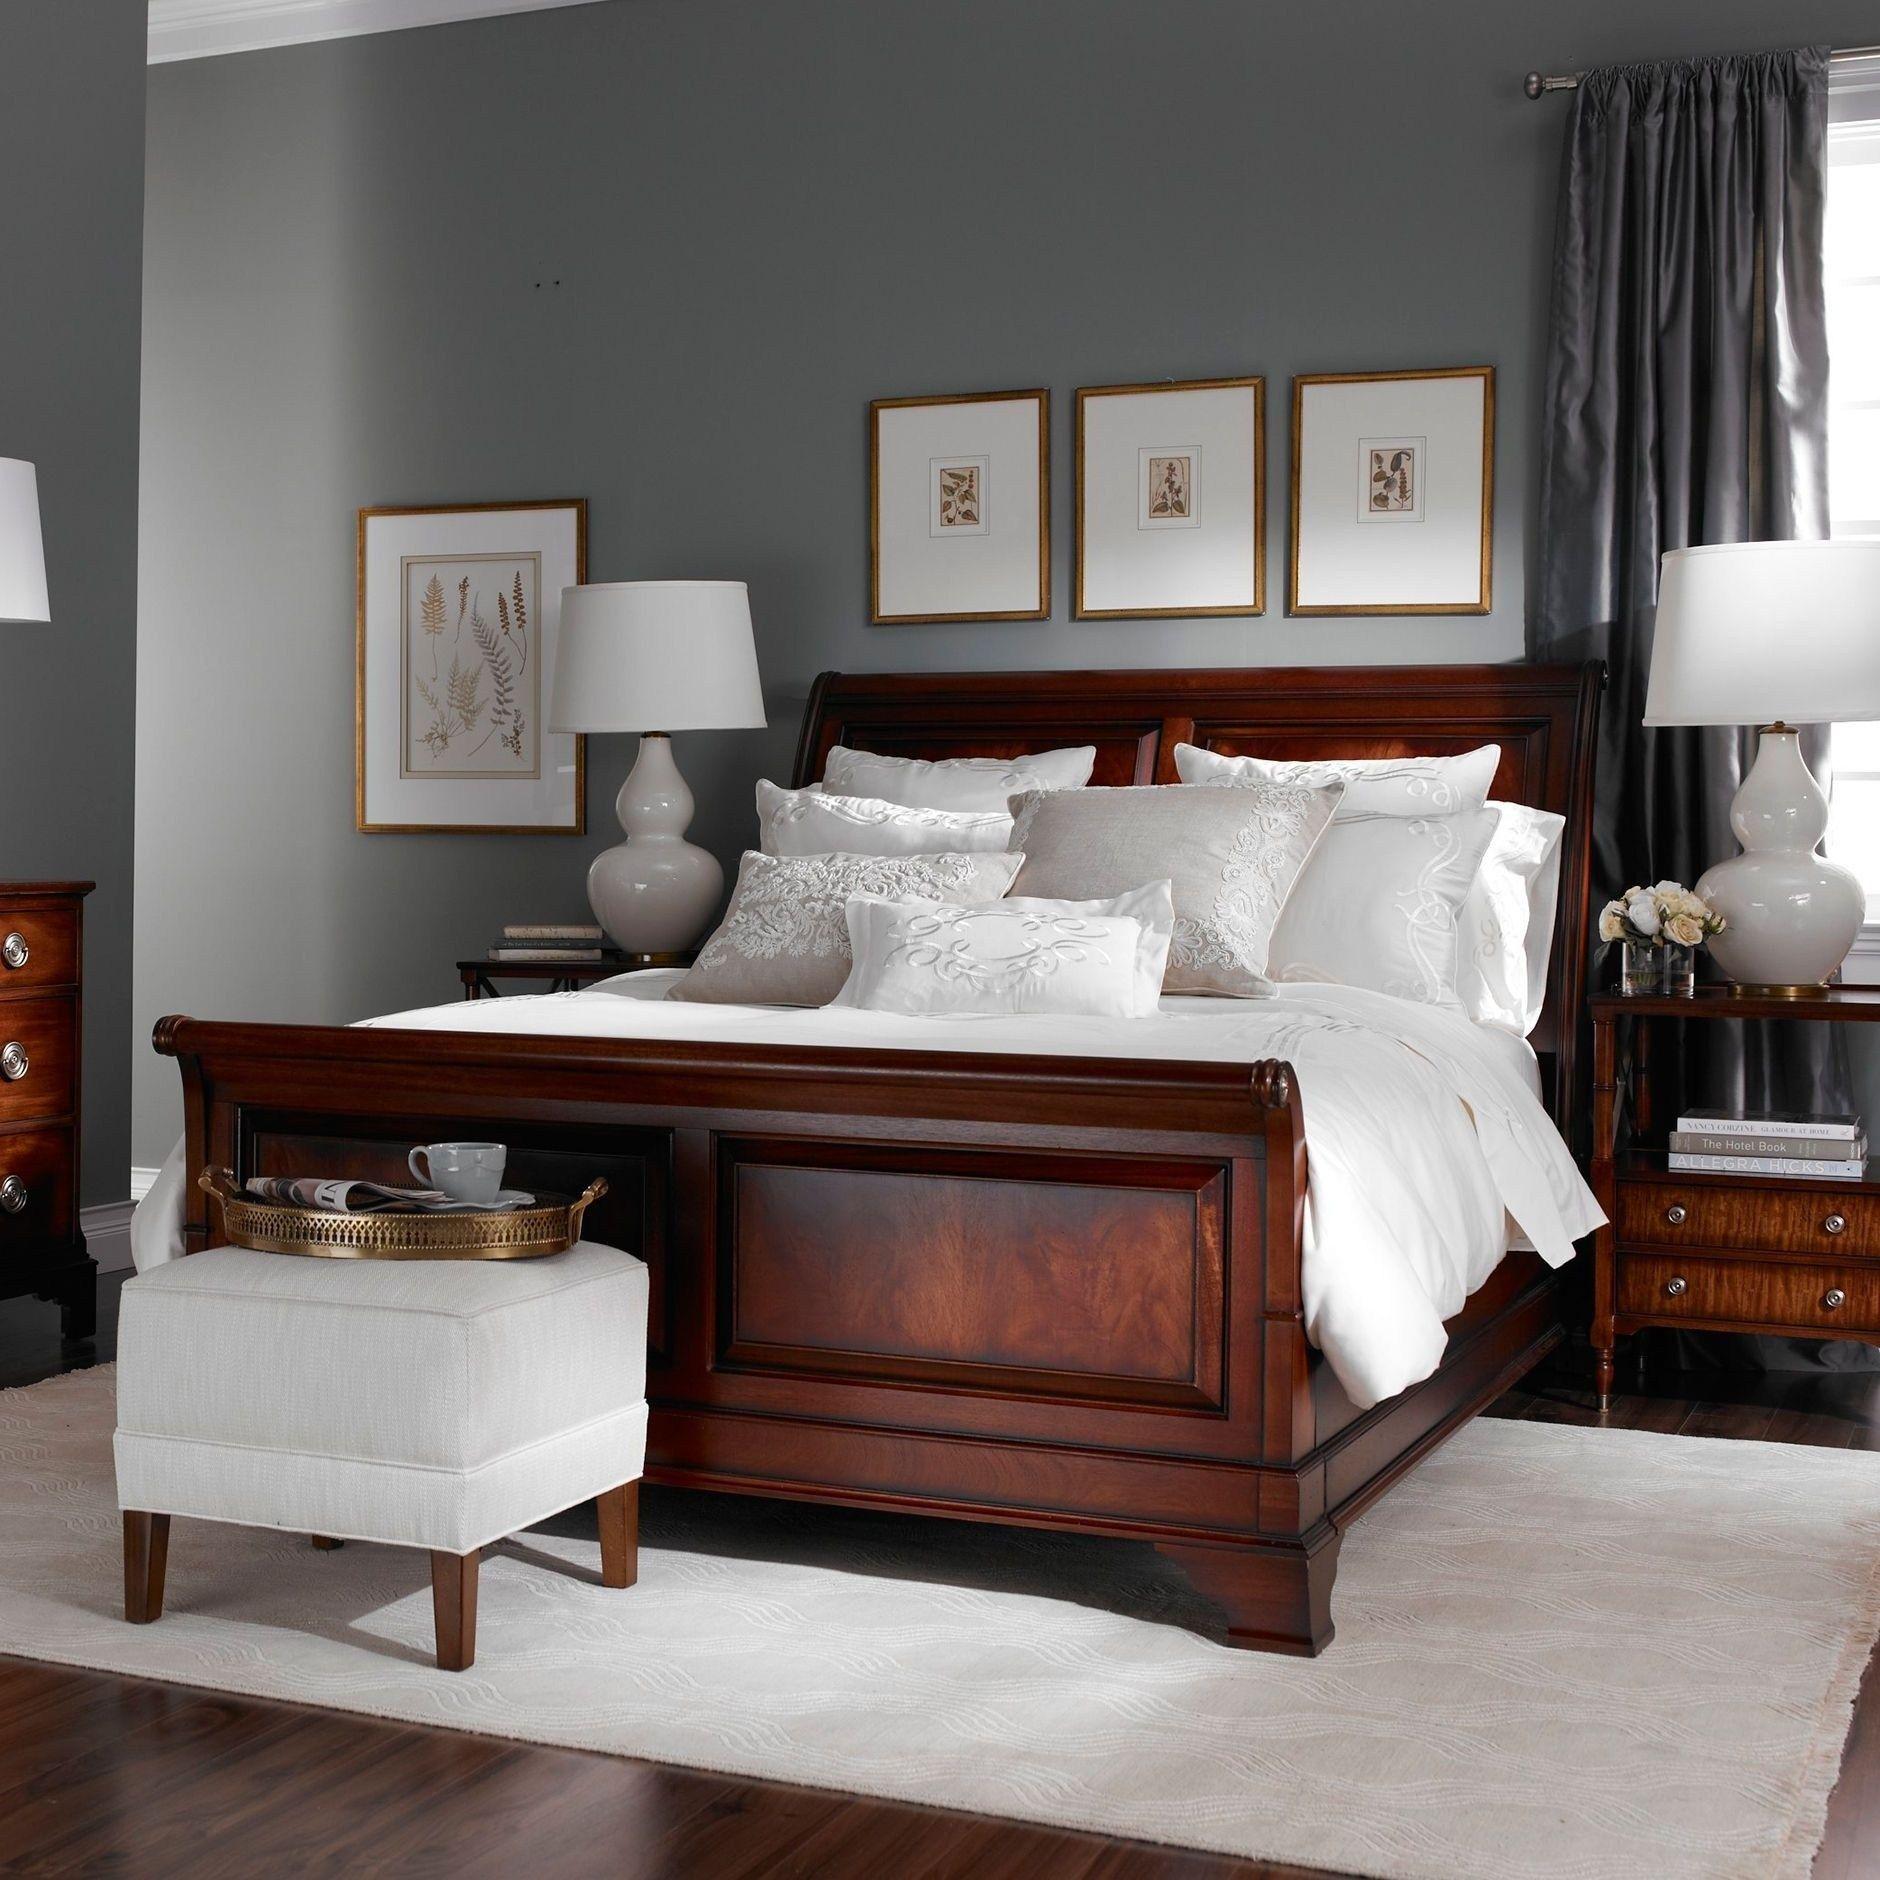 5+ Popular Bedroom Decorating Ideas With Dark Wood Furniture